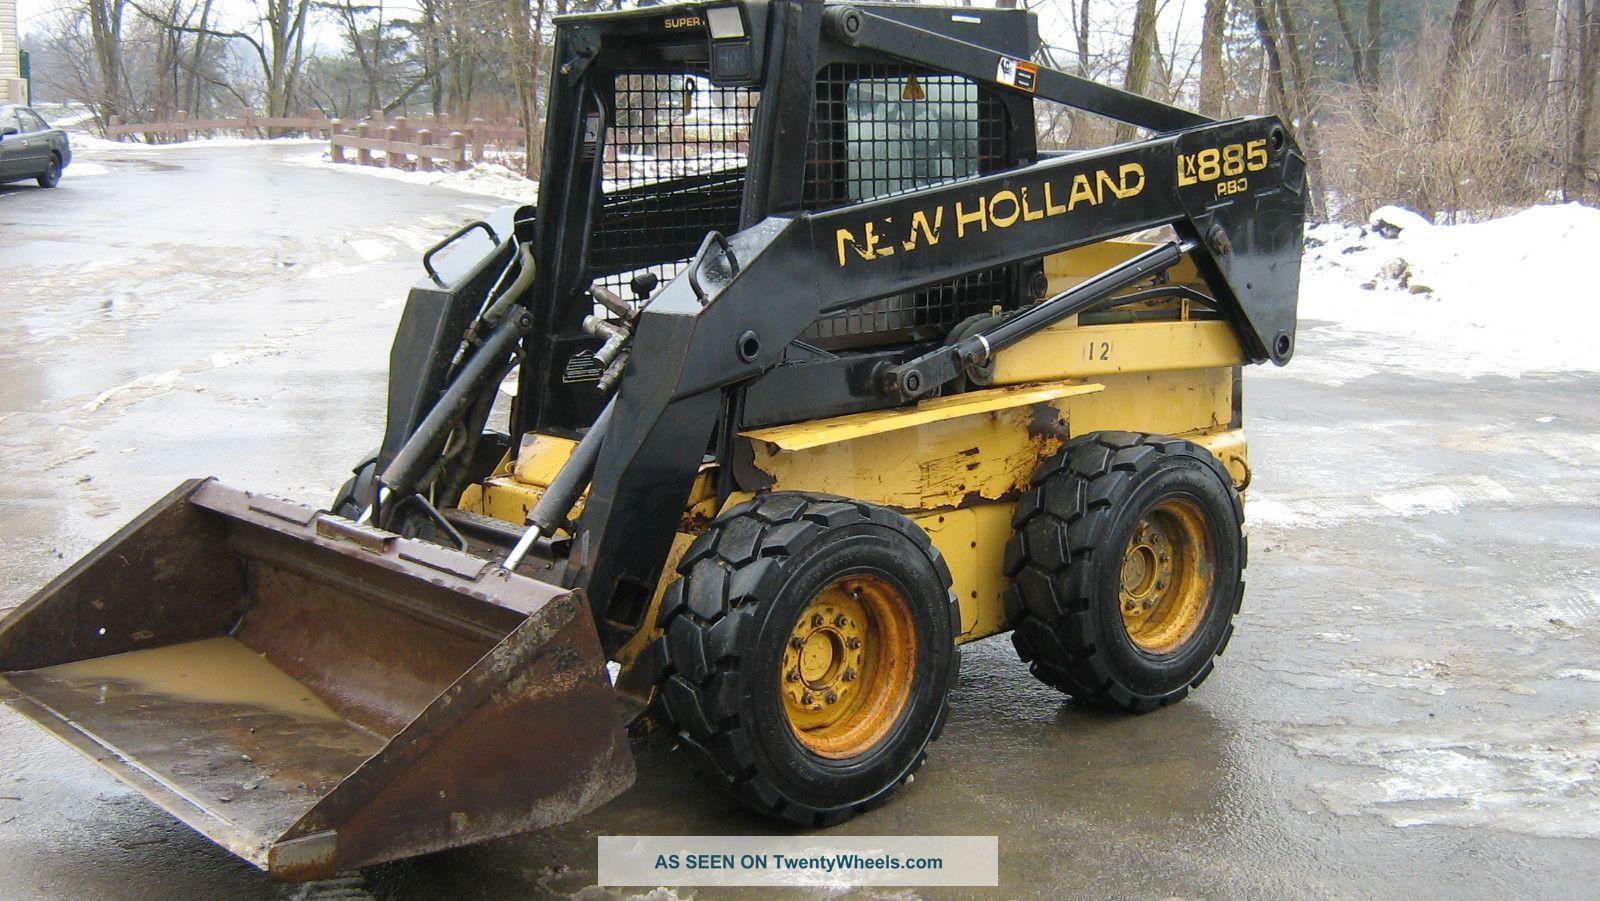 New Holland Lx885 Specs Skid Steer Loader Parts Manual  U2013 Crawler